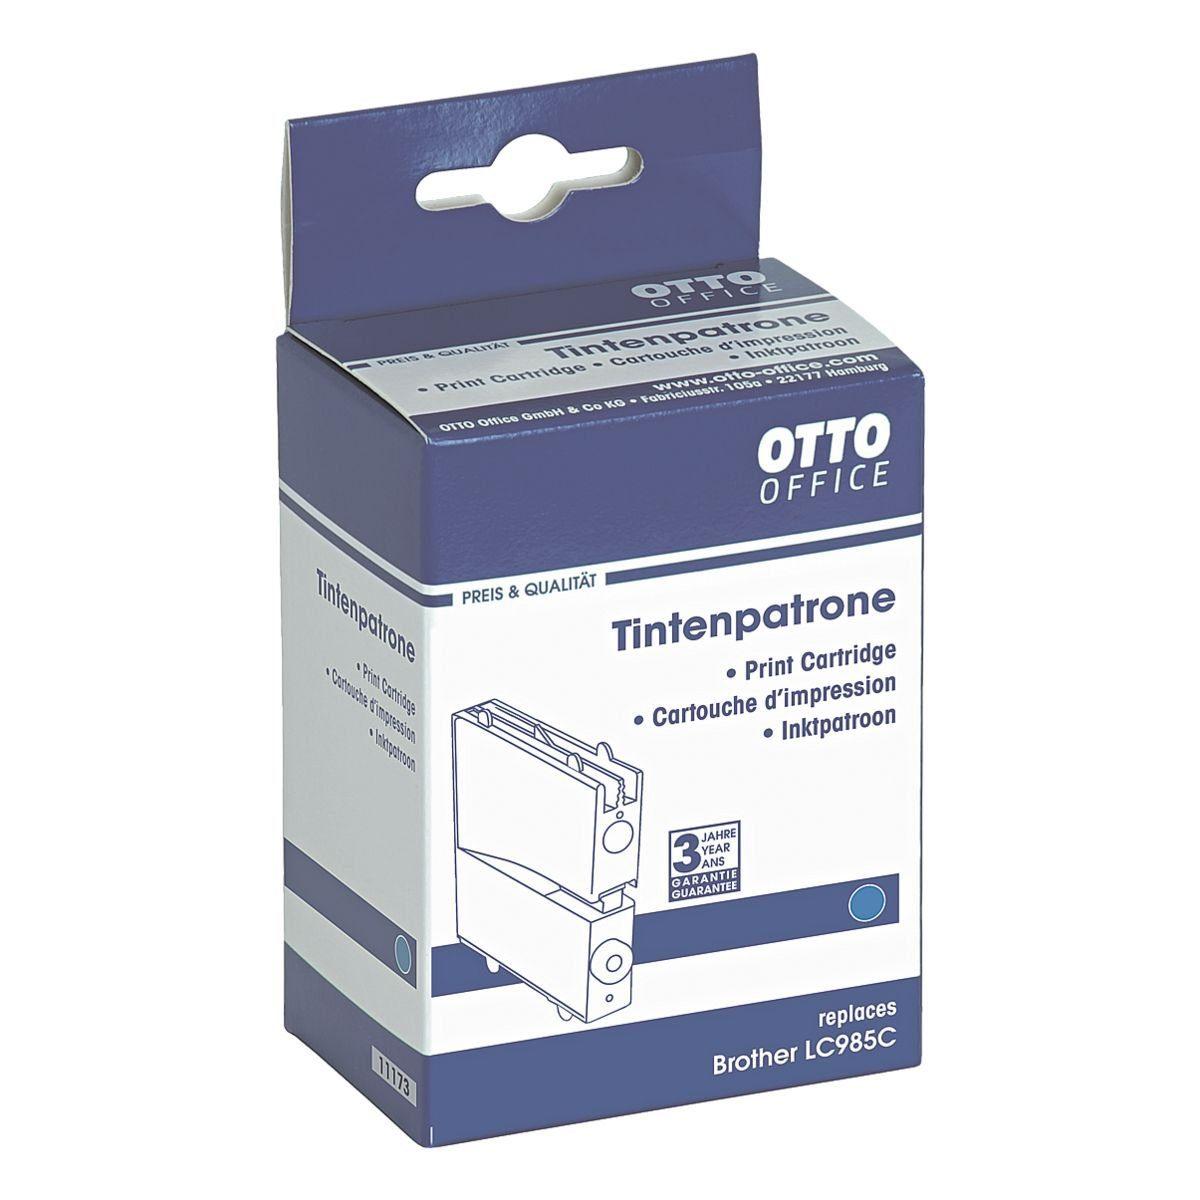 OTTO Office Tintenpatrone ersetzt Brother »LC985C«